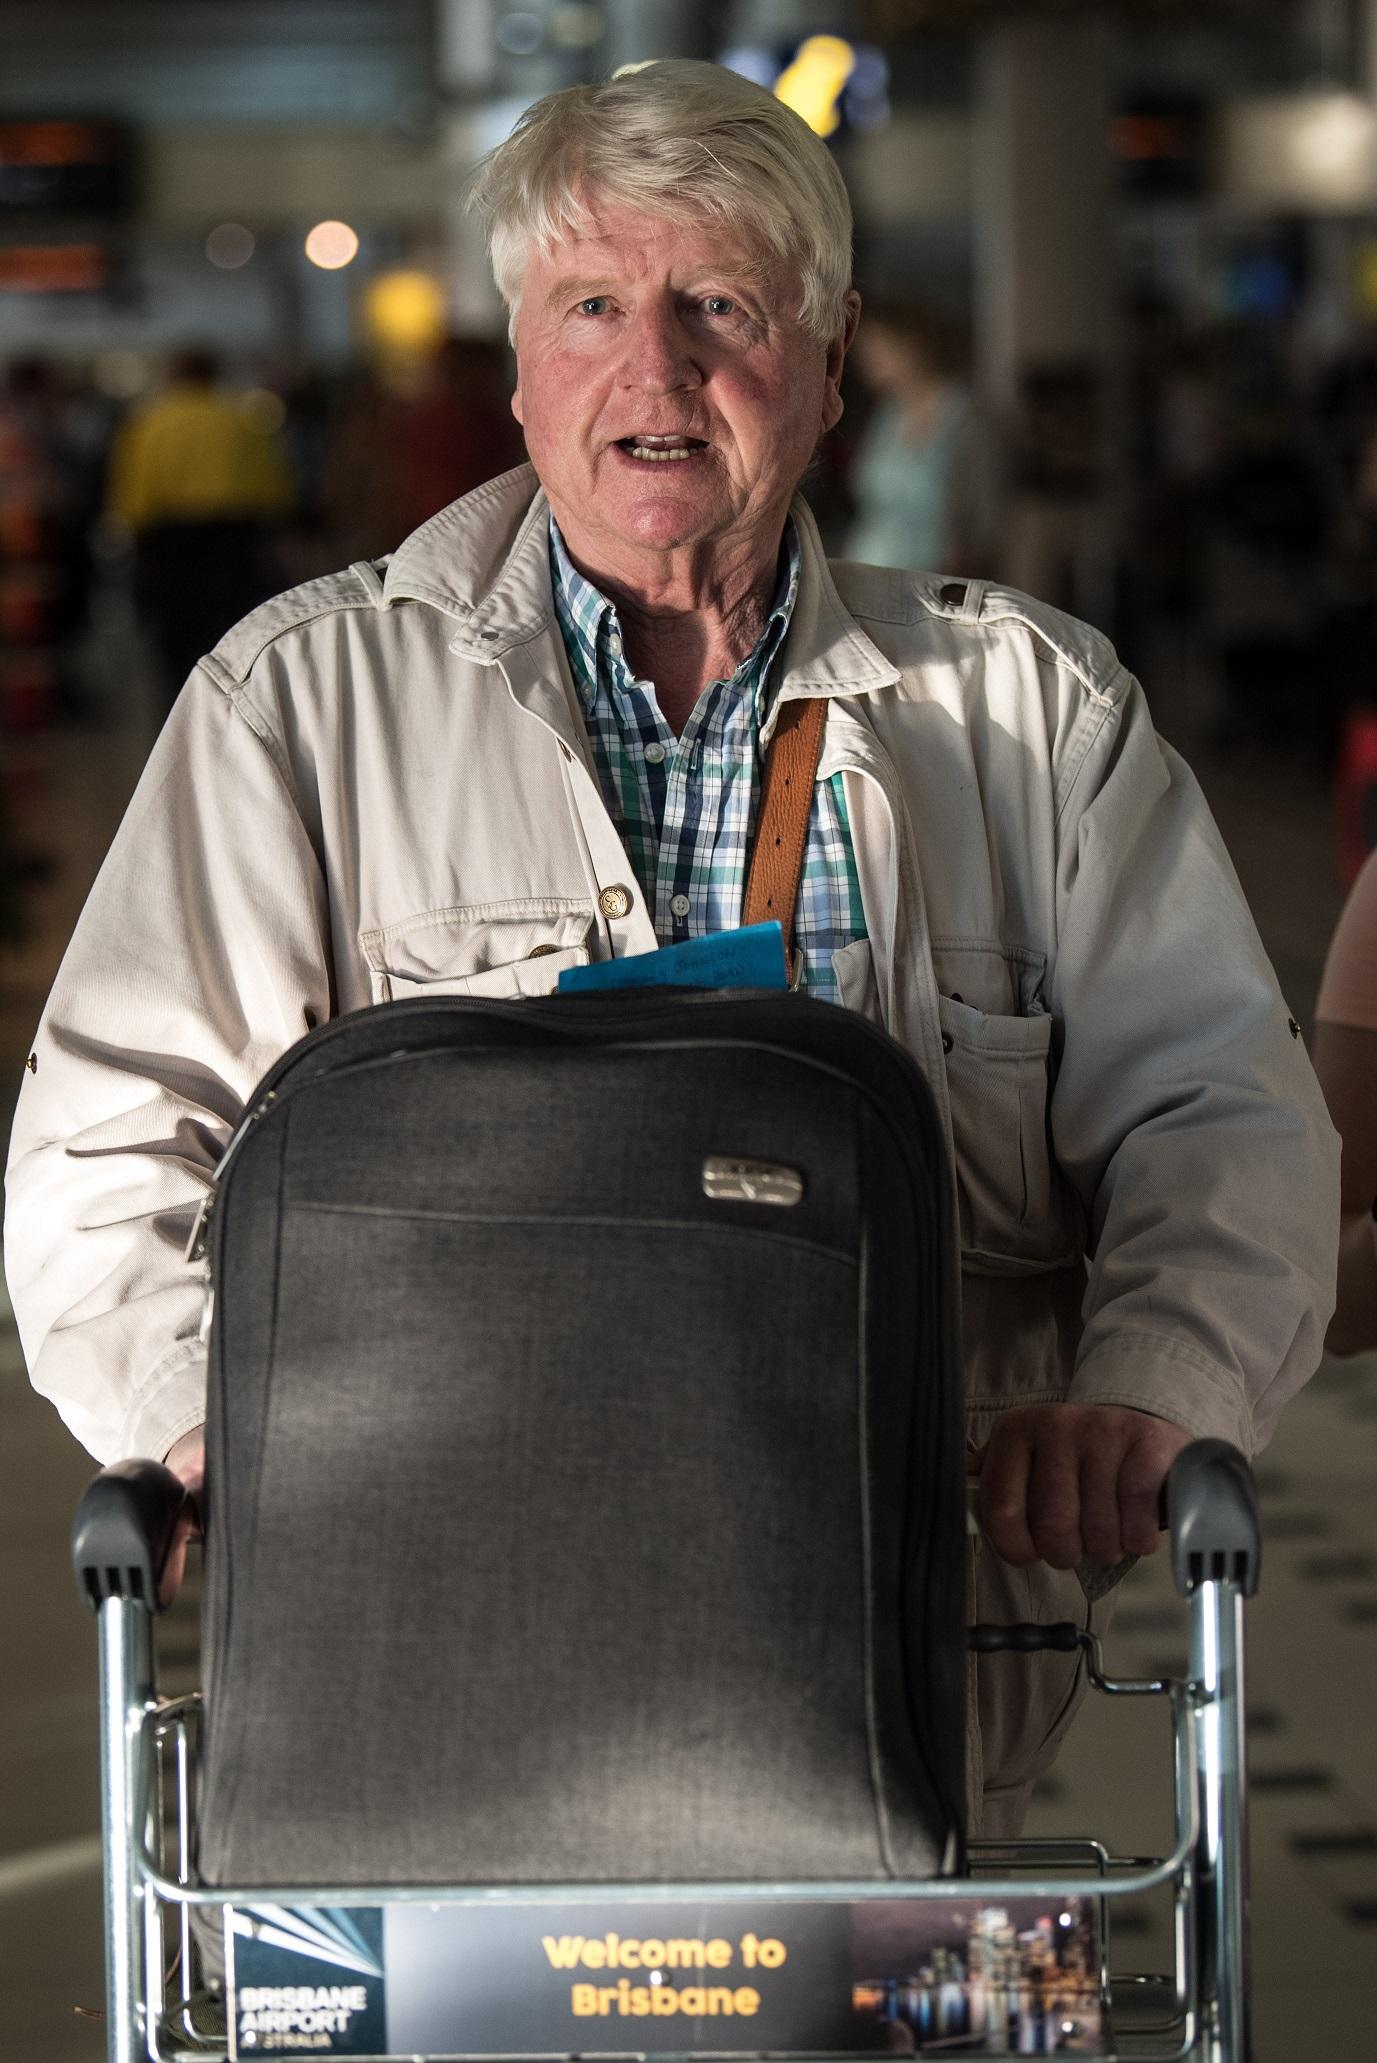 Stanley Johnson arriving in Australia (James Gourley/REX/Shutterstock)